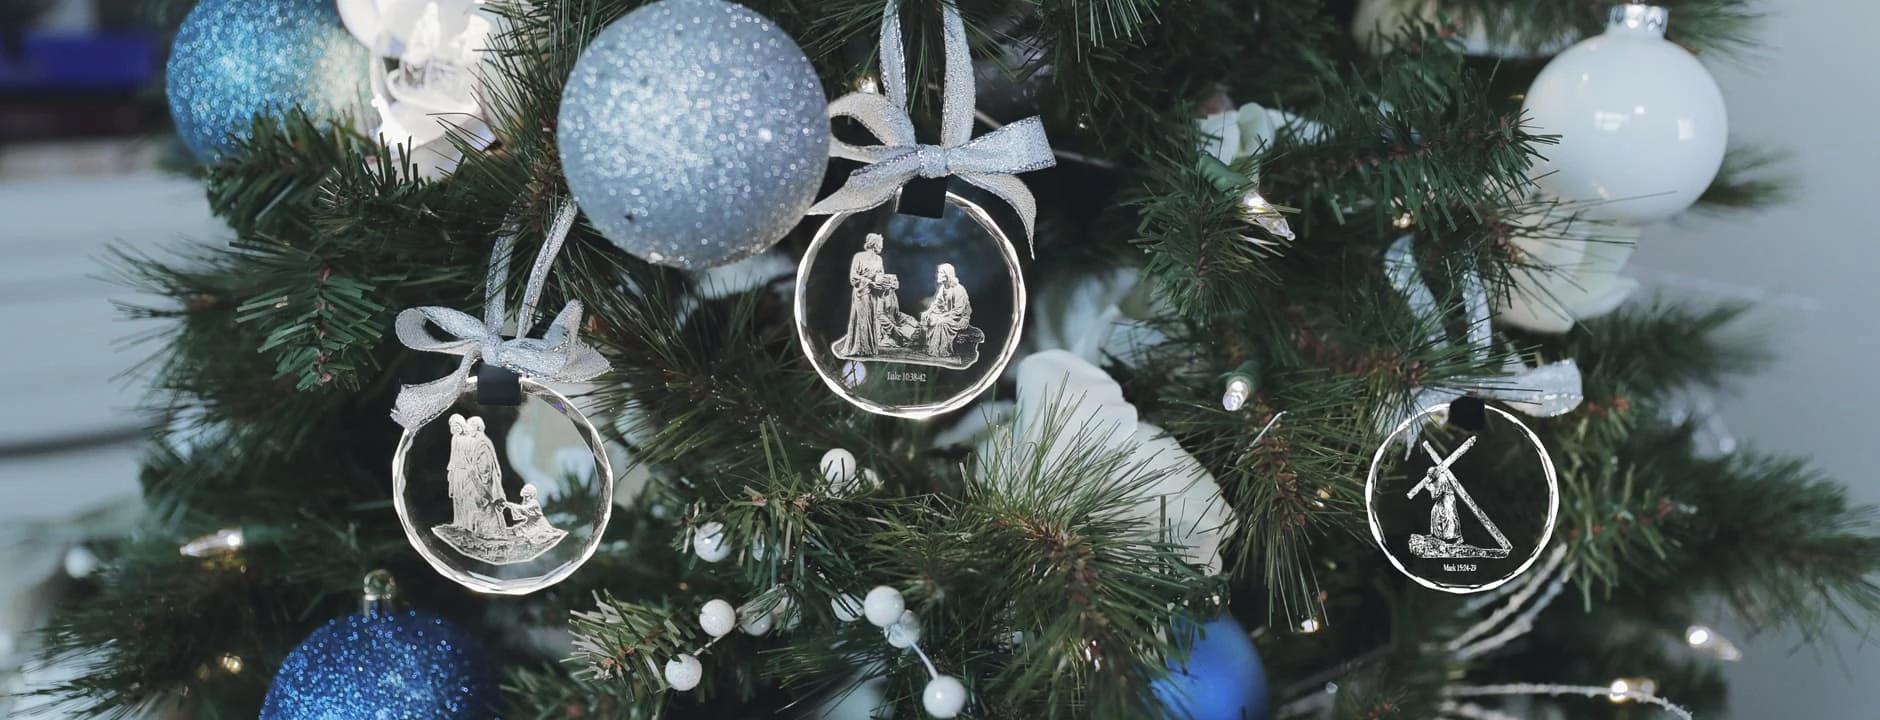 Organize Holiday Decorations